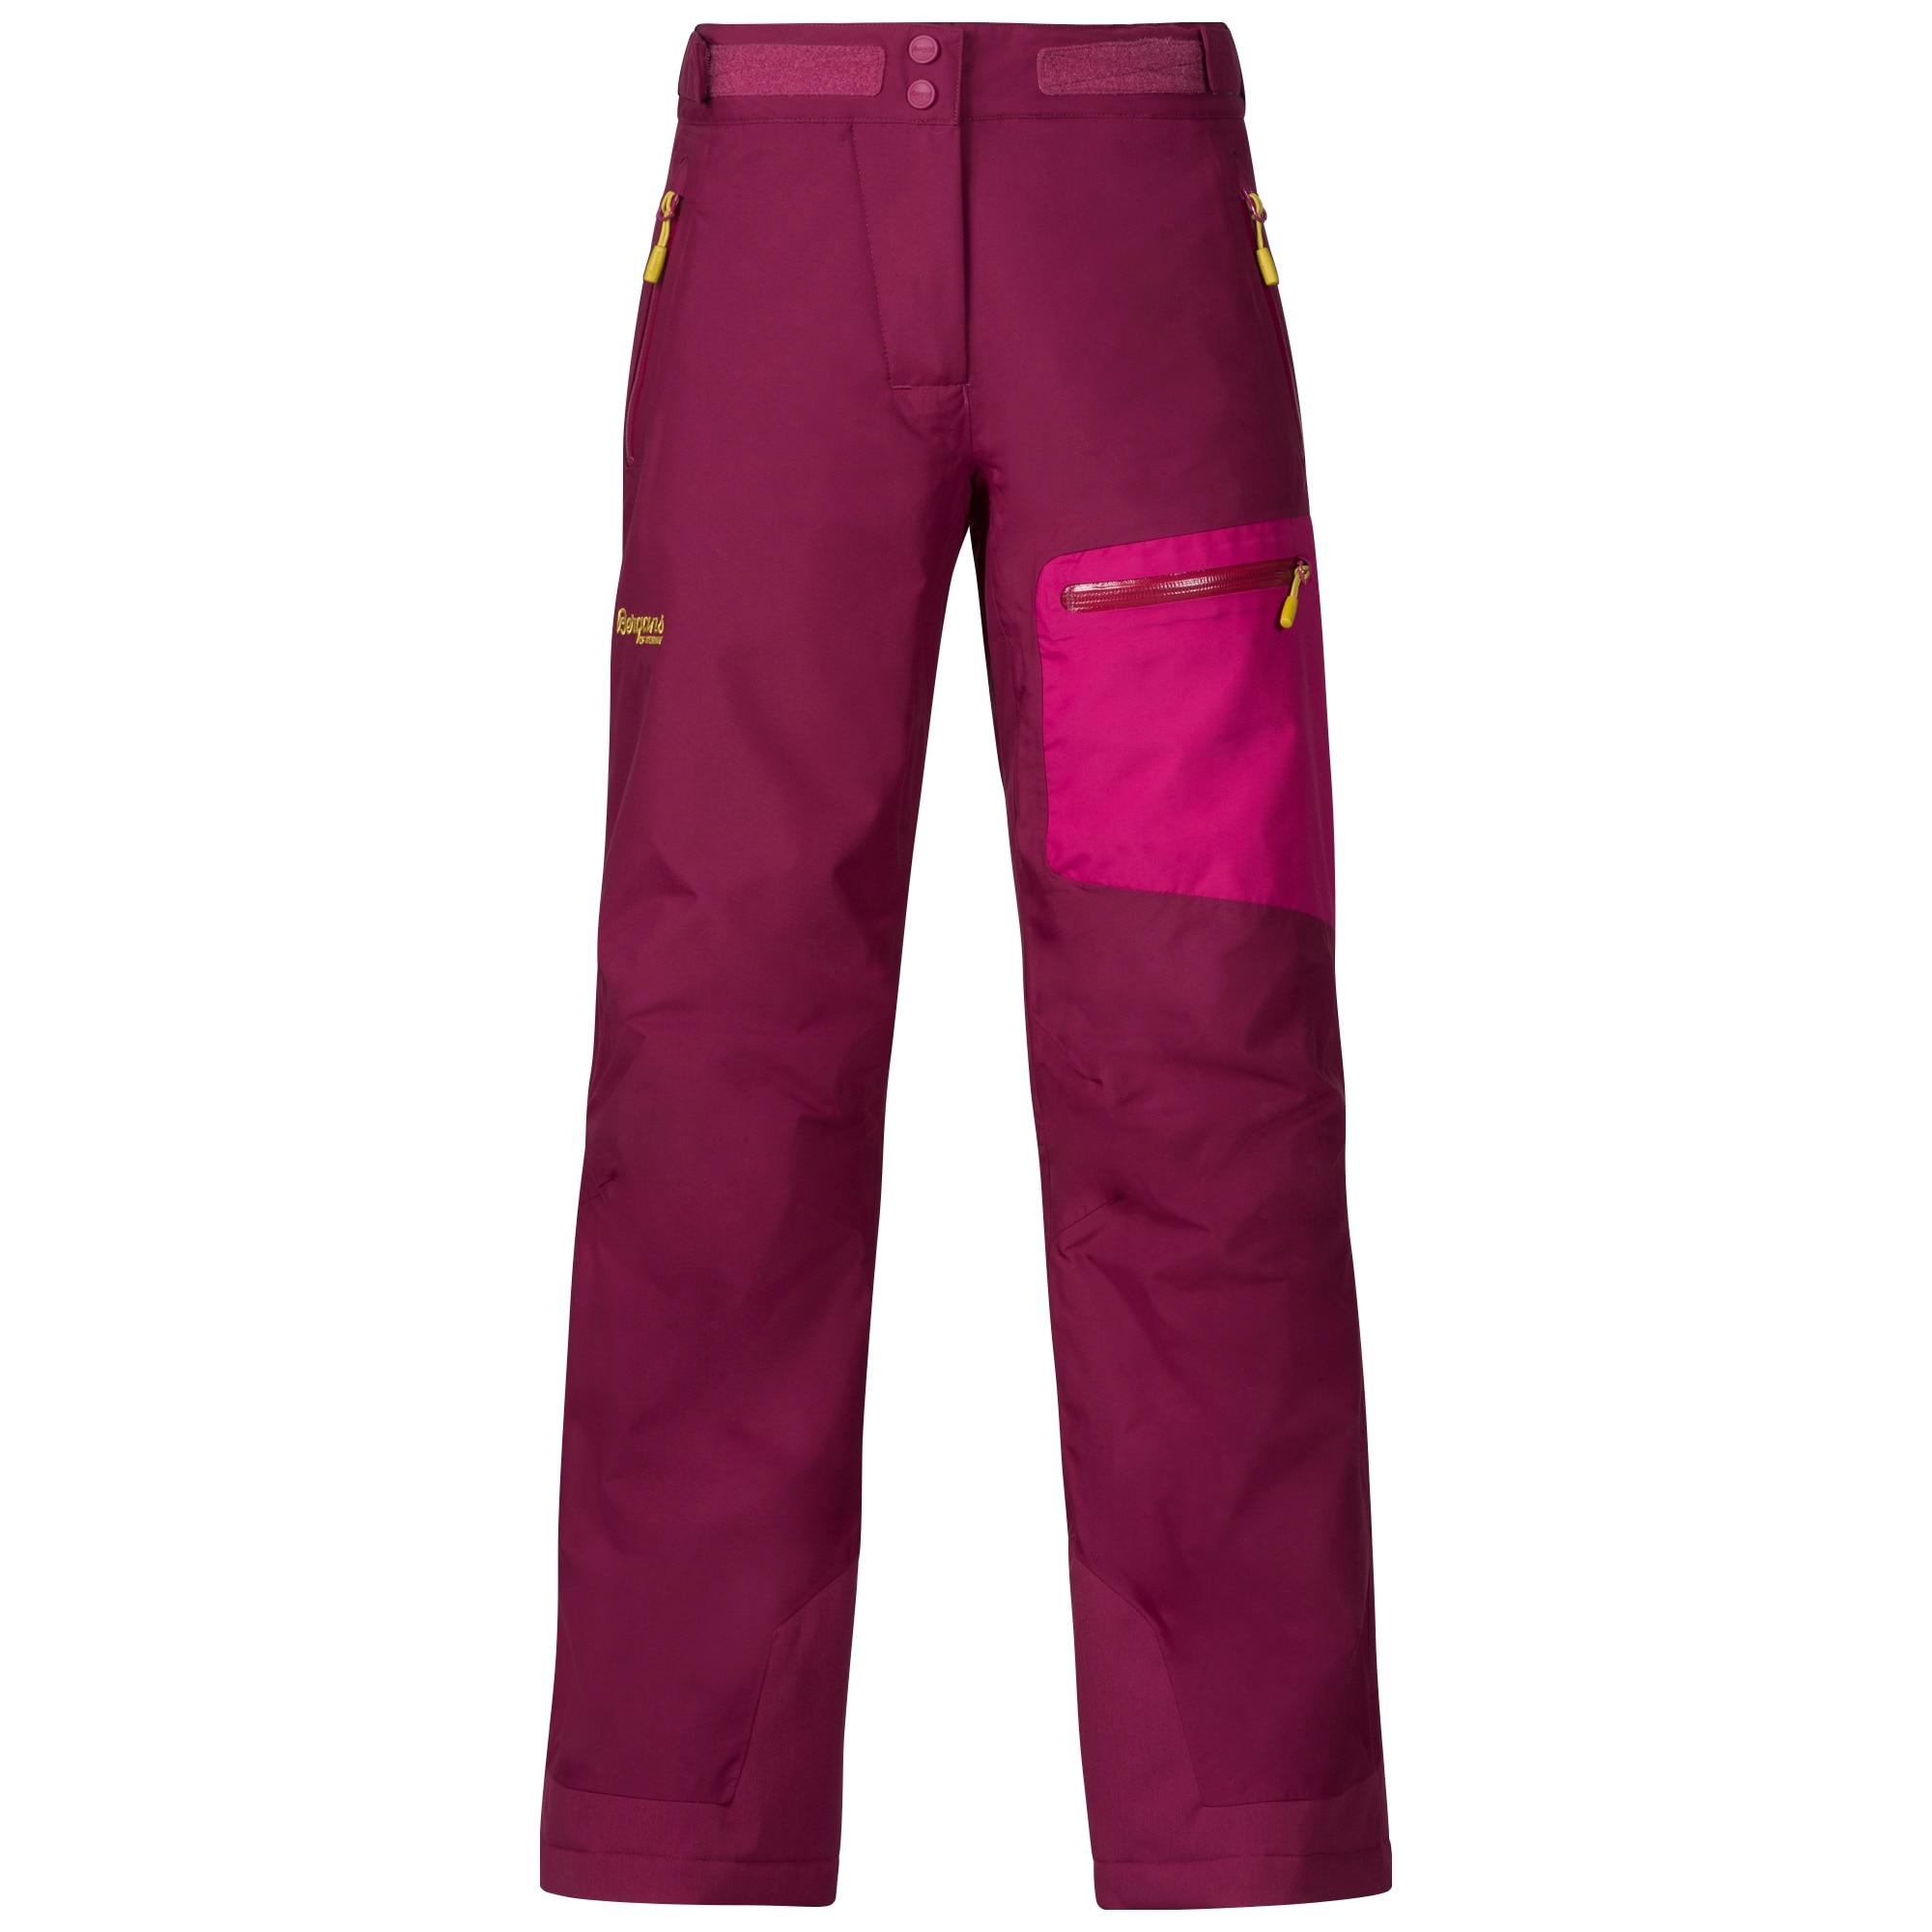 Knyken Insulated Youth Girl Pants